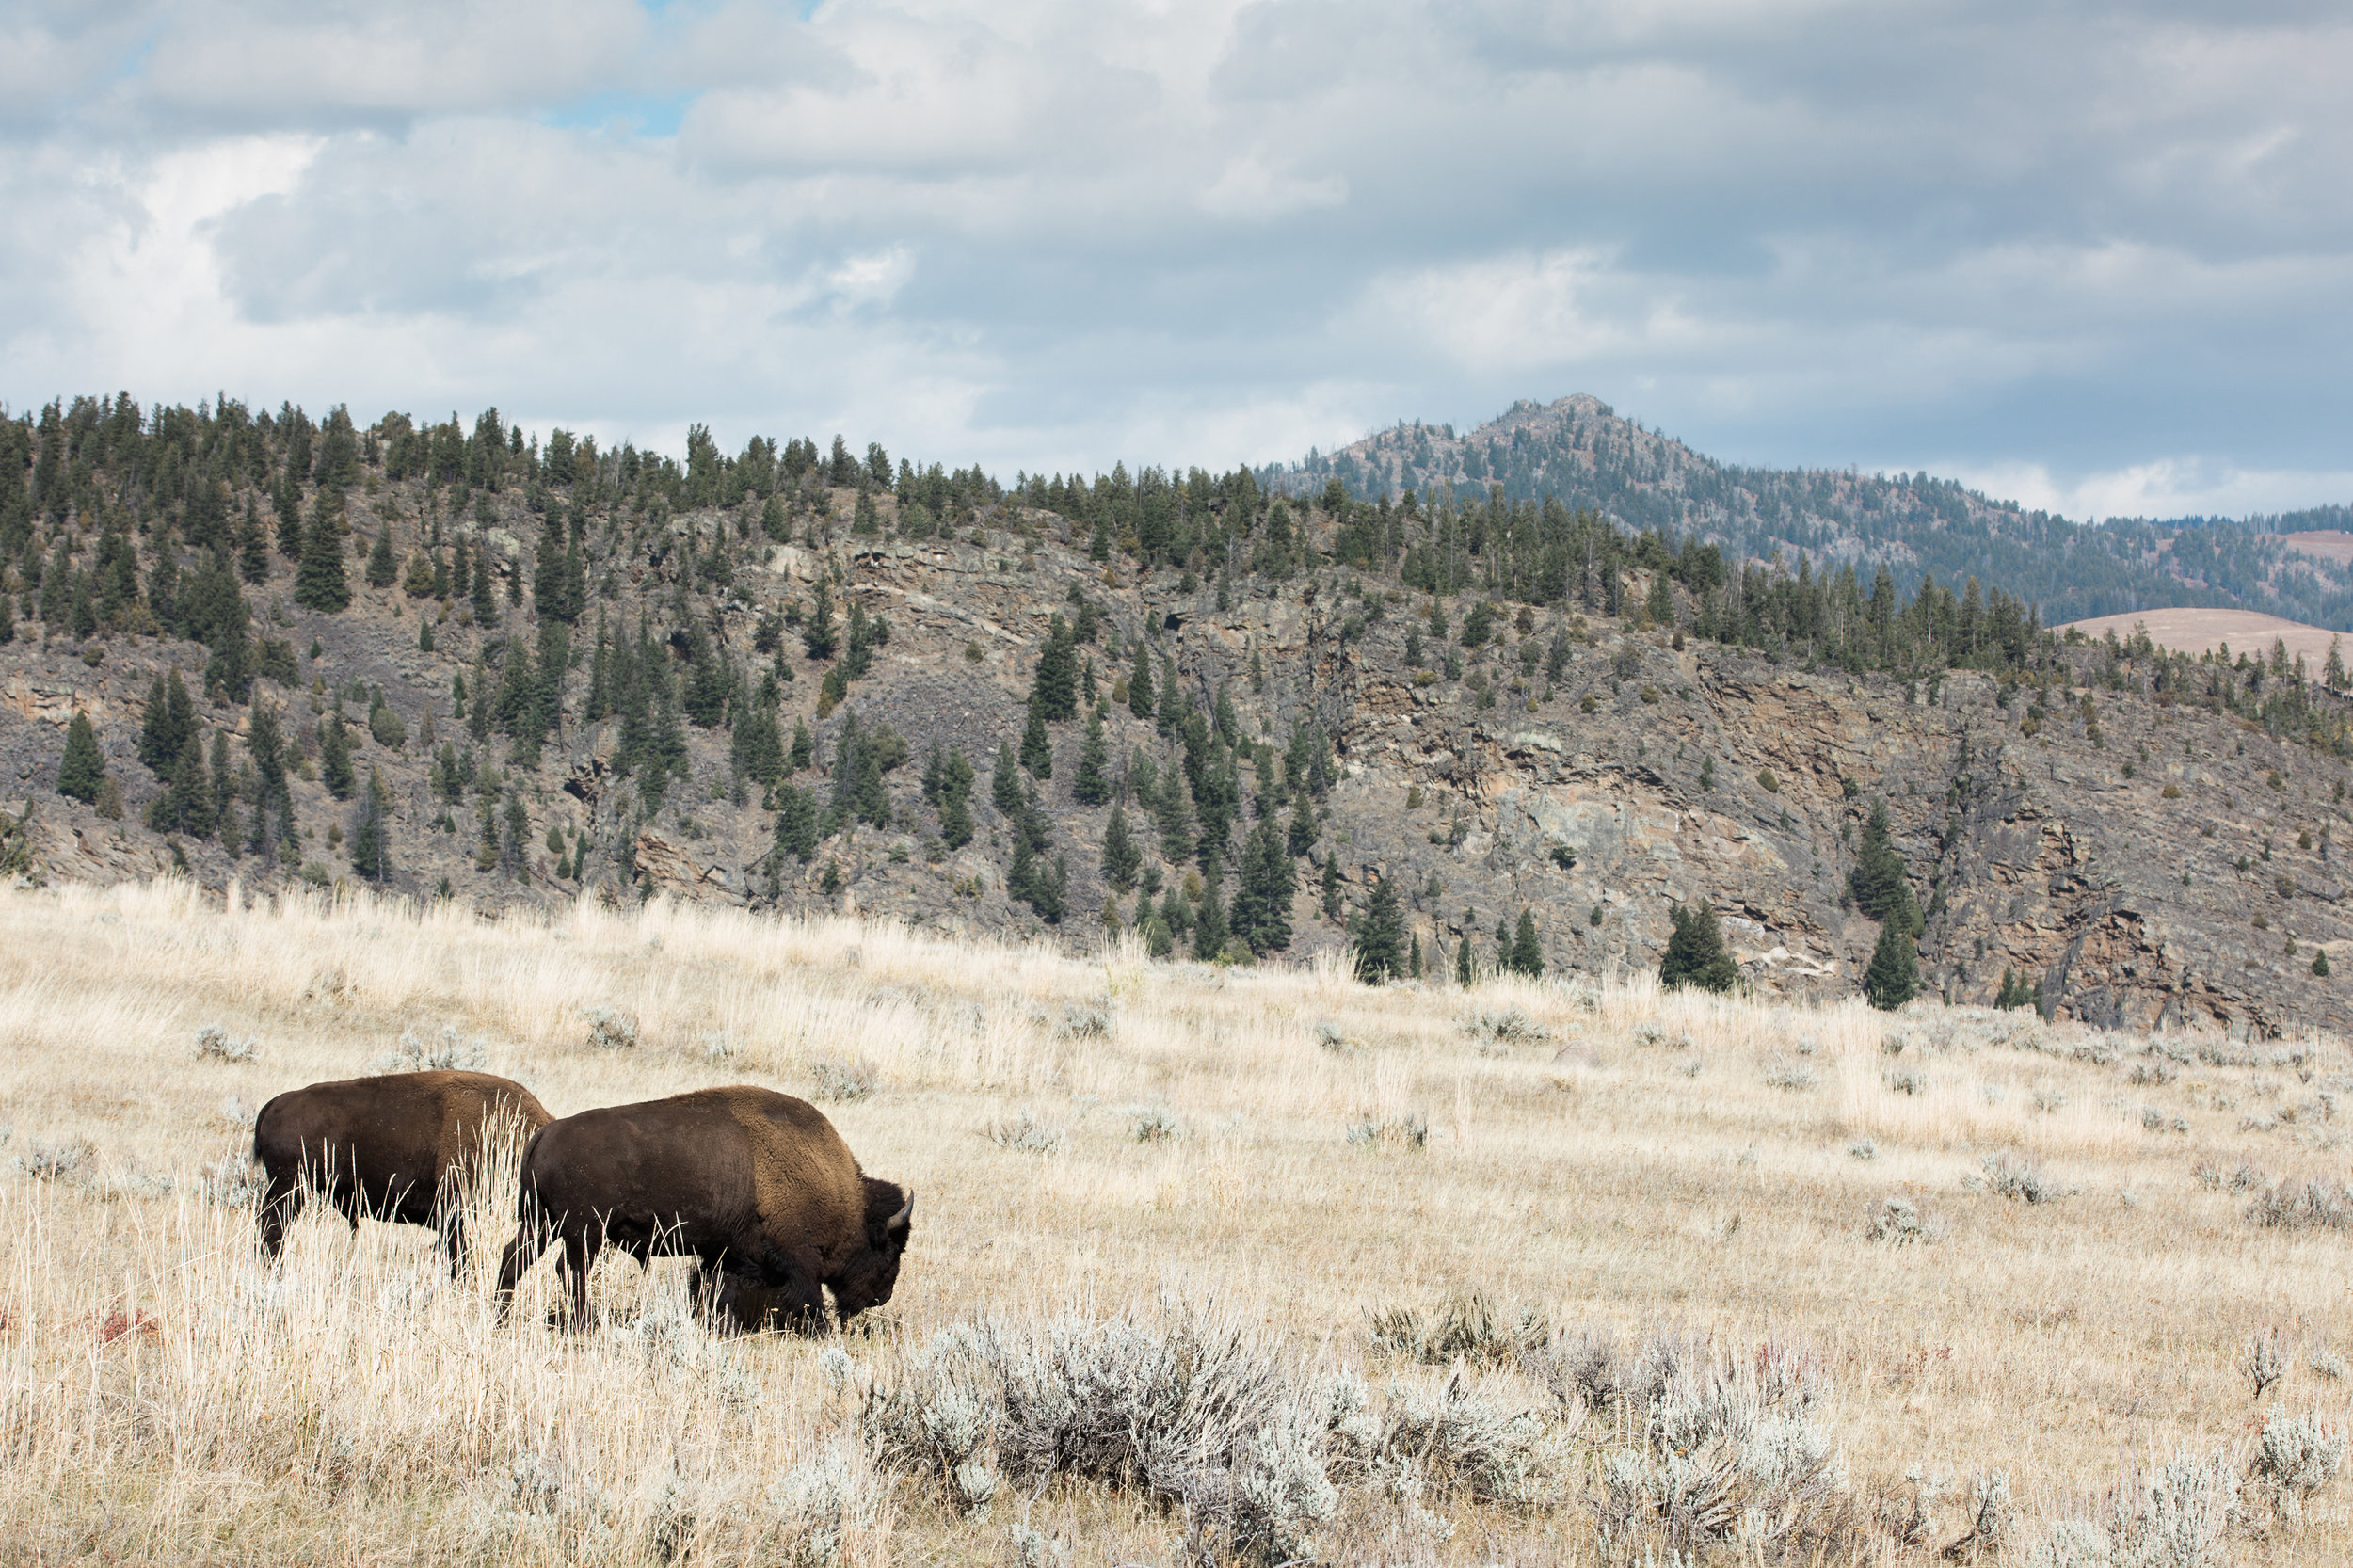 CindyGiovagnoli_Yellowstone_National_Park_Montana_Wyoming_bison_pronghorn_snow_elk_truckcamping-013.jpg